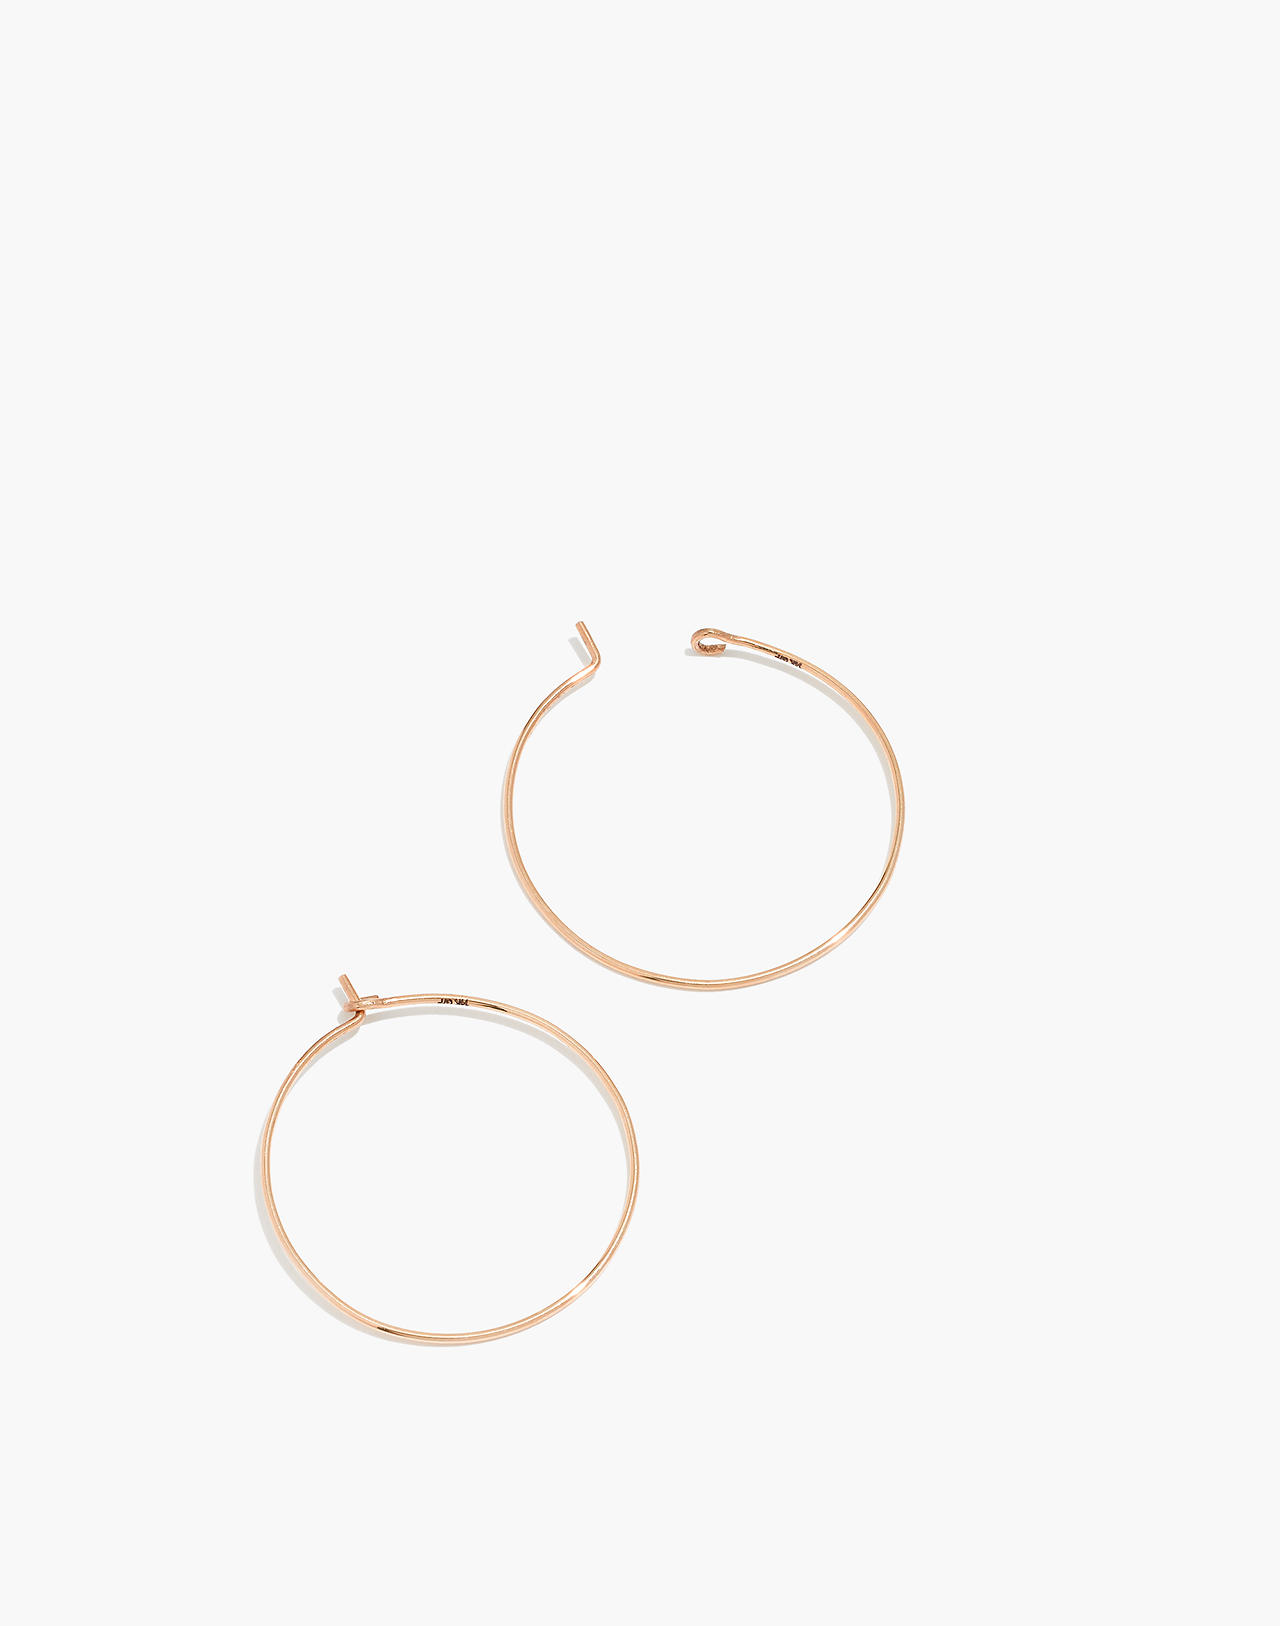 14k Gold-Filled Medium Hoop Earrings in 14k gold fill image 1